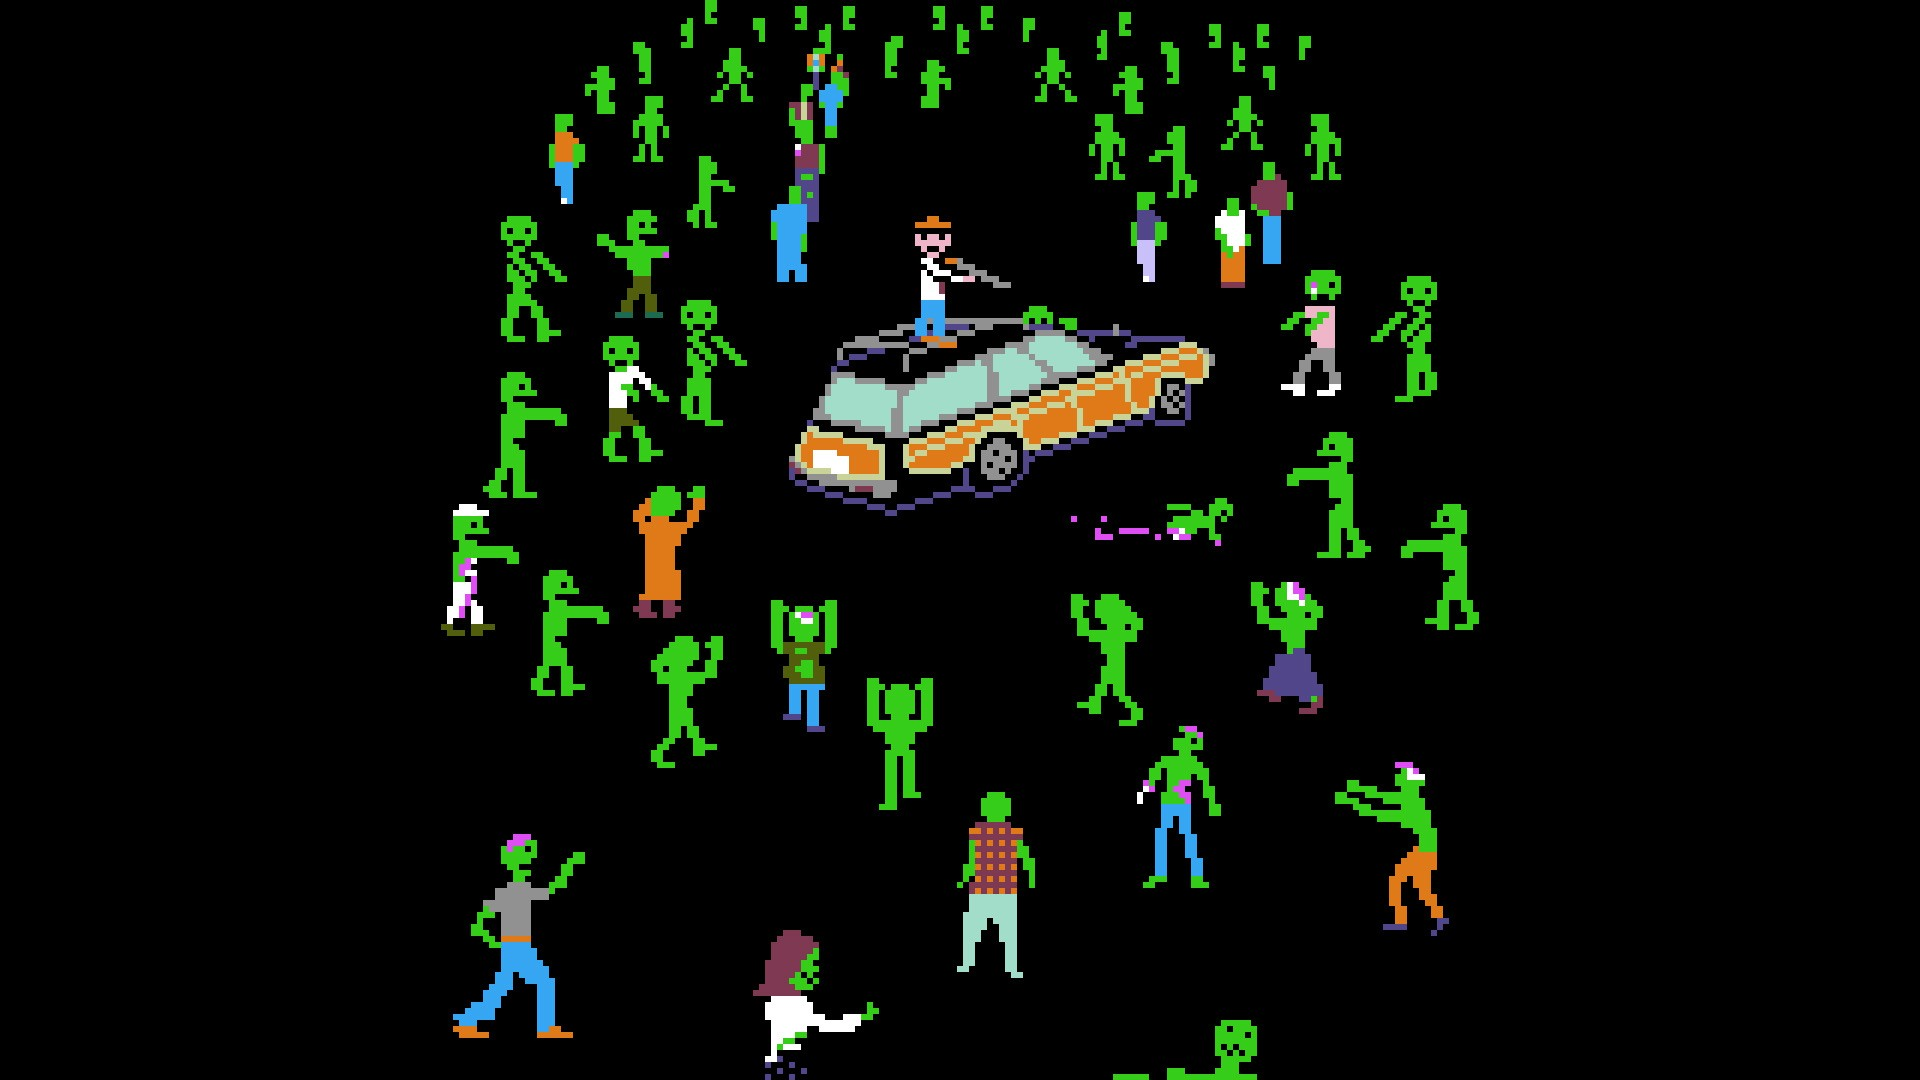 General 1920x1080 black background digital art minimalism zombies video games retro games pixels gun men car Killer green Shaun of the Dead